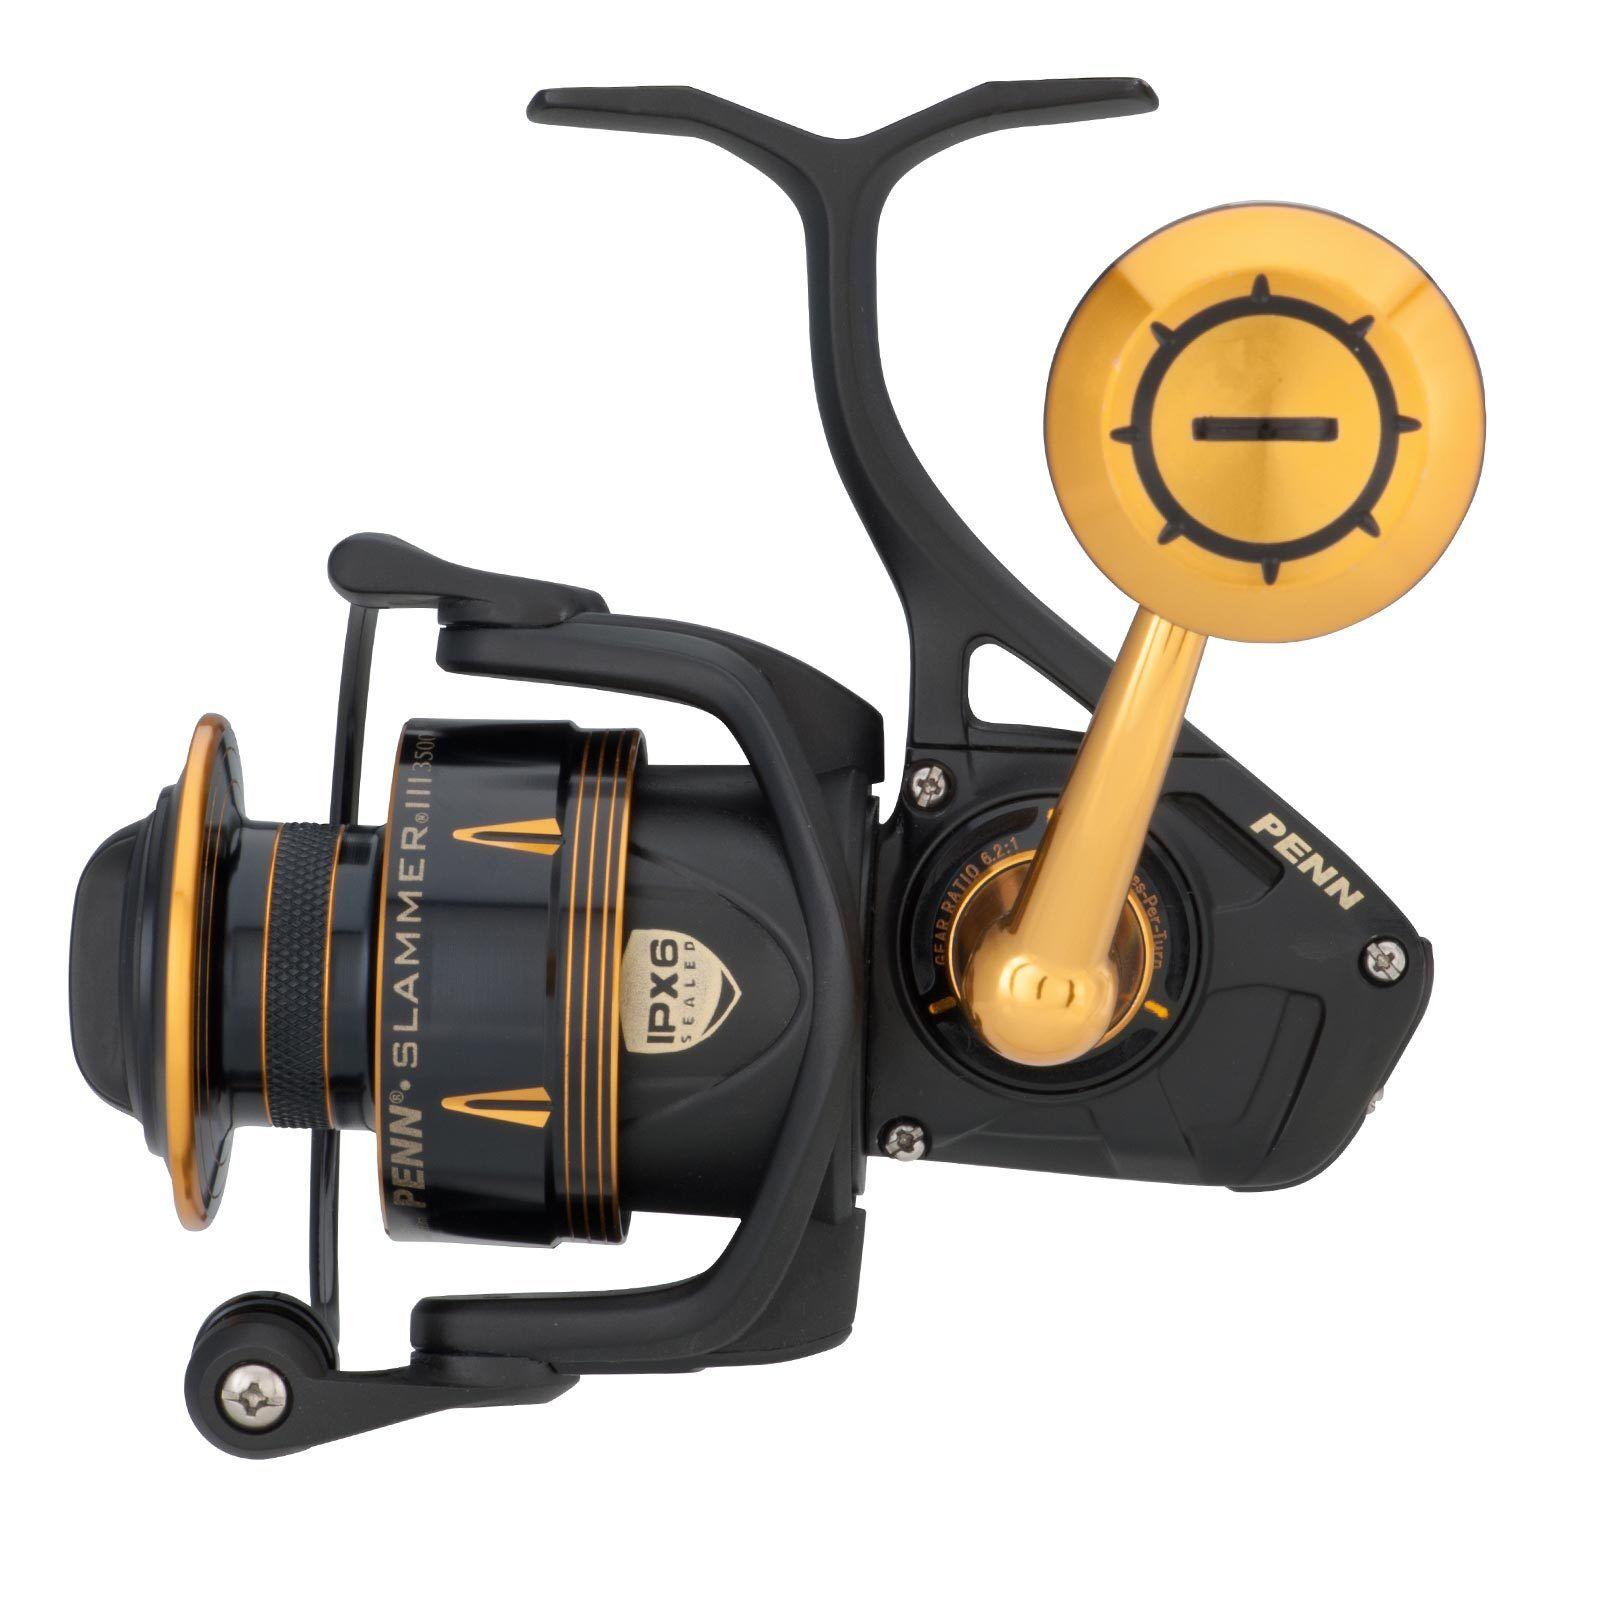 Cocherete pesca pesca agua salada Cocherete - ha corregido Penn Slammer III 4500